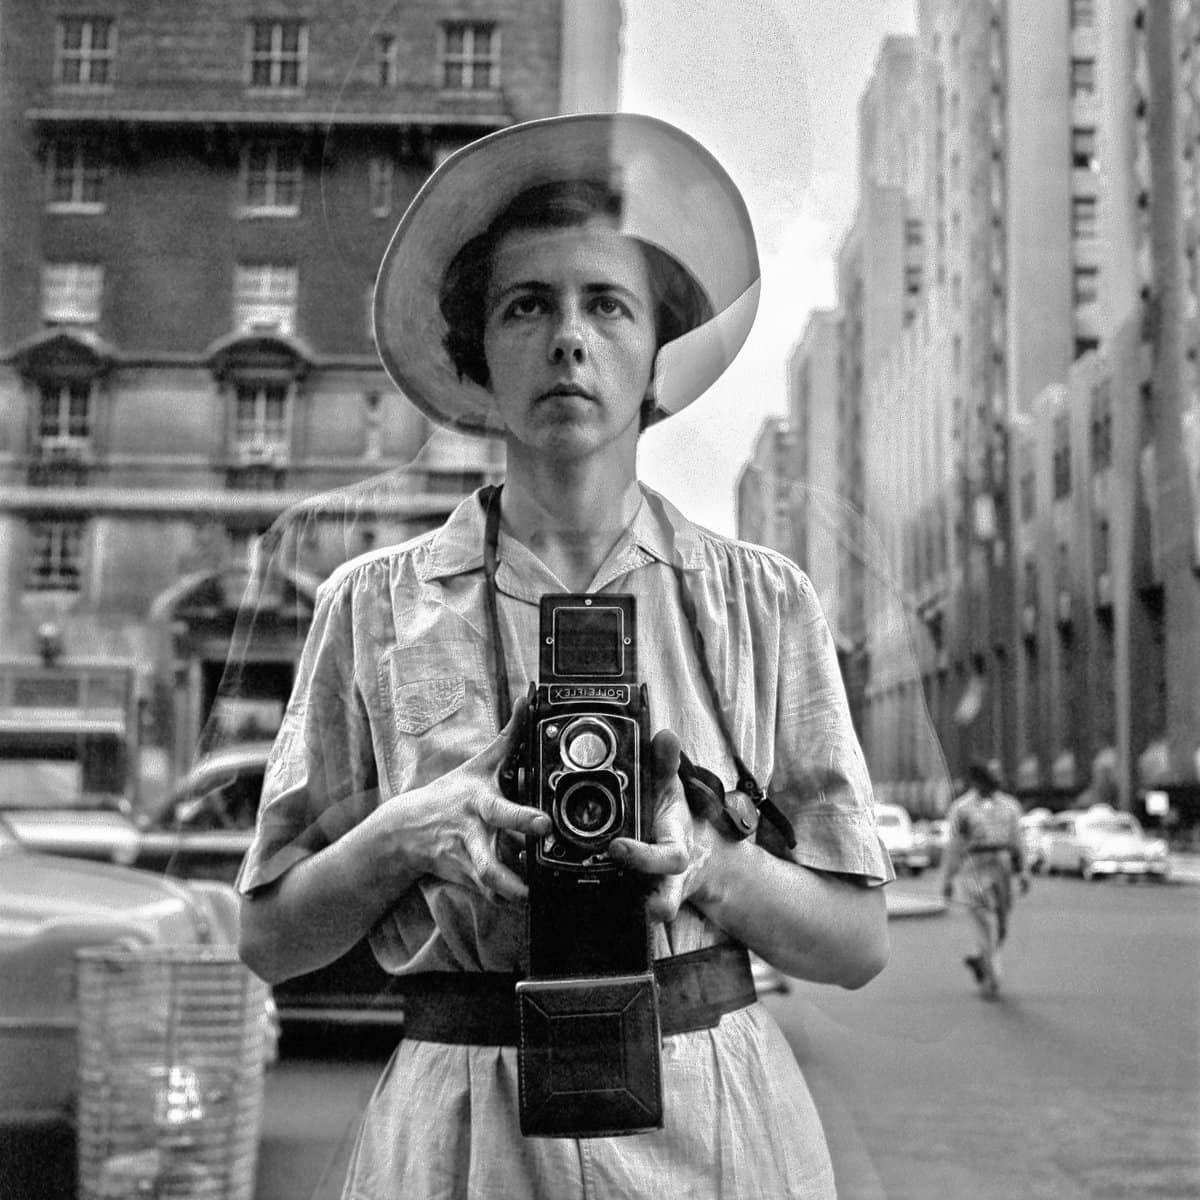 Vintage selfie - Vivian Maier reflected in a shop window self-portrait (1950s) at ClickAmericana com